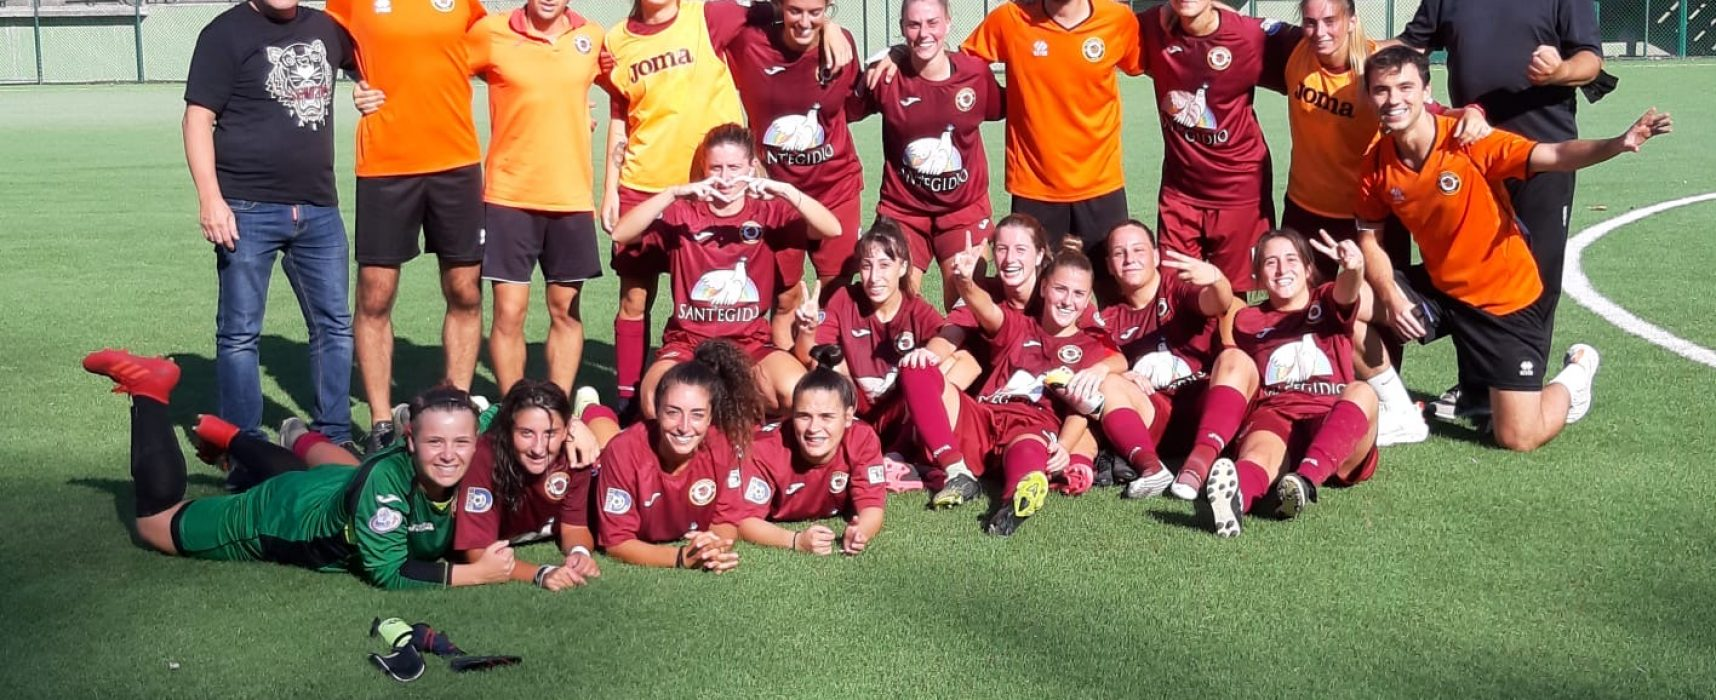 Coppa Italia Serie C Femminile: il Trastevere vince in rimonta